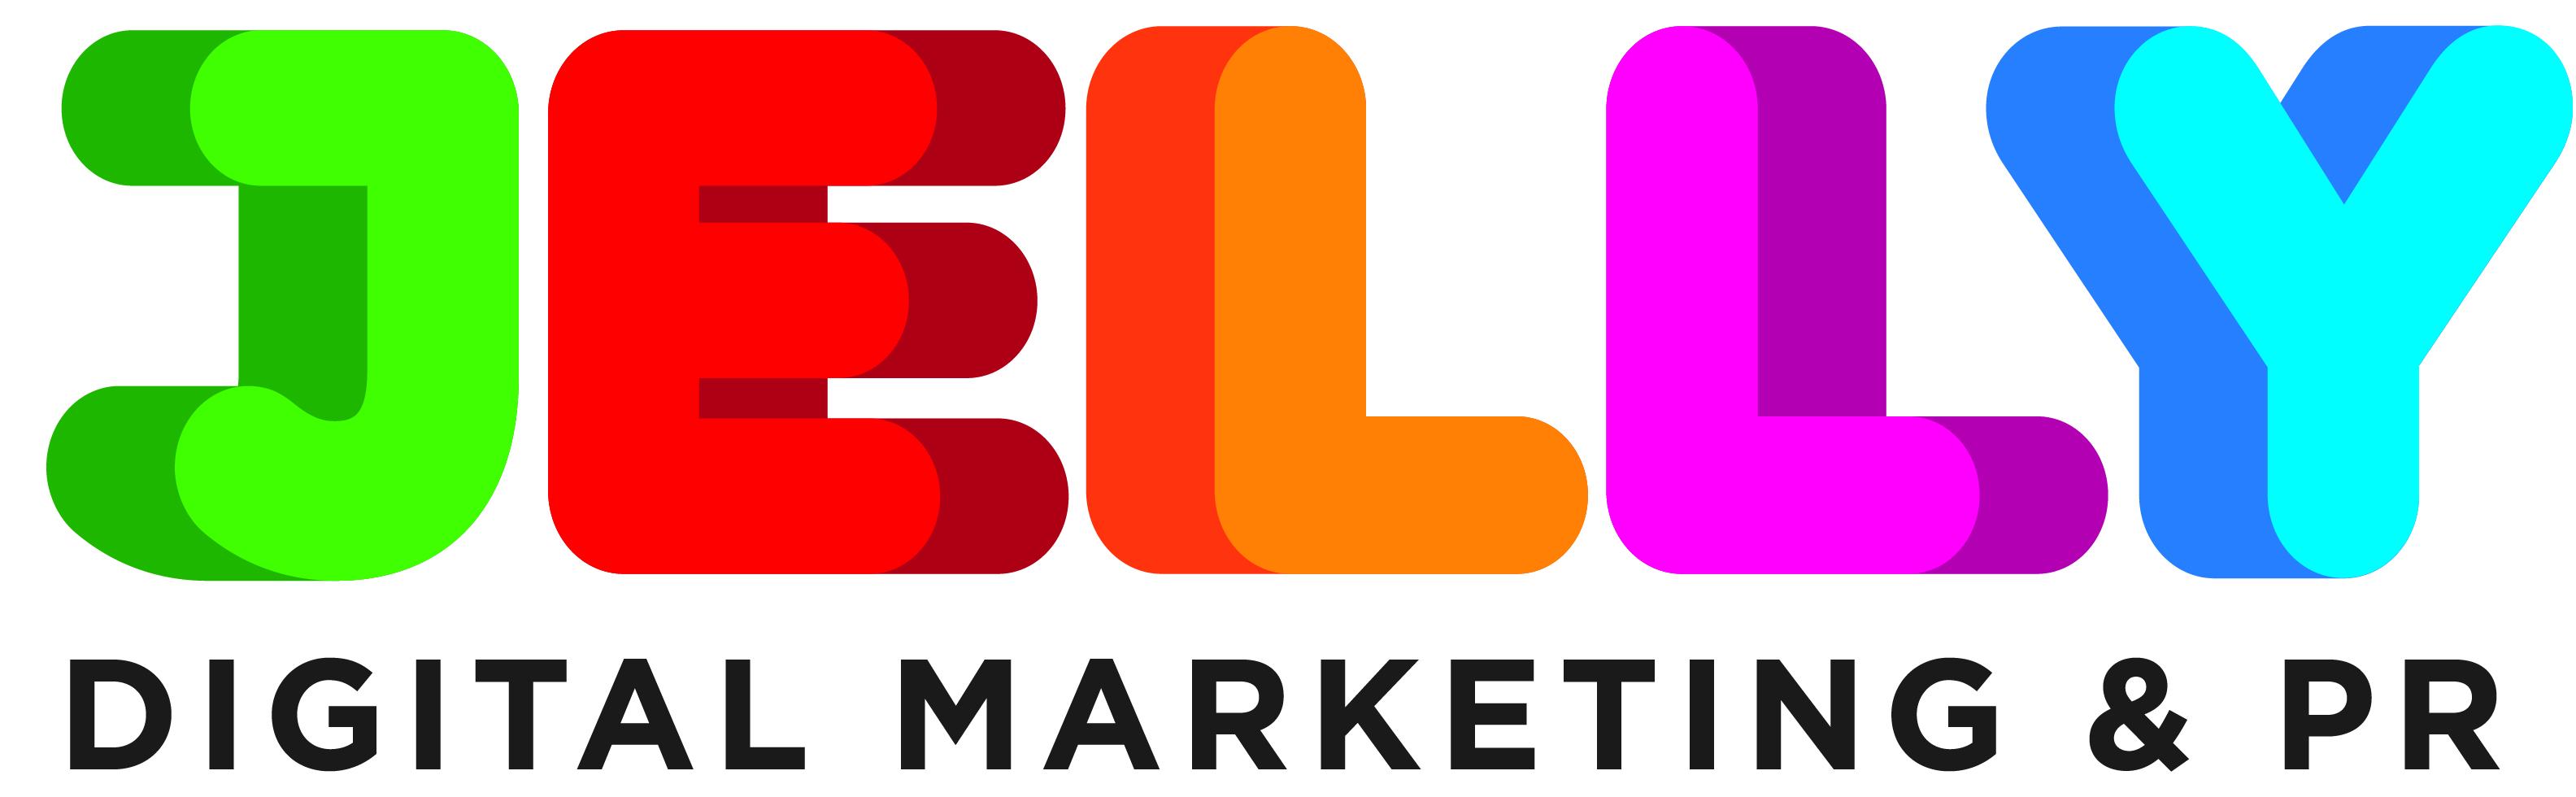 Jelly Marketing & PR Agency Logo